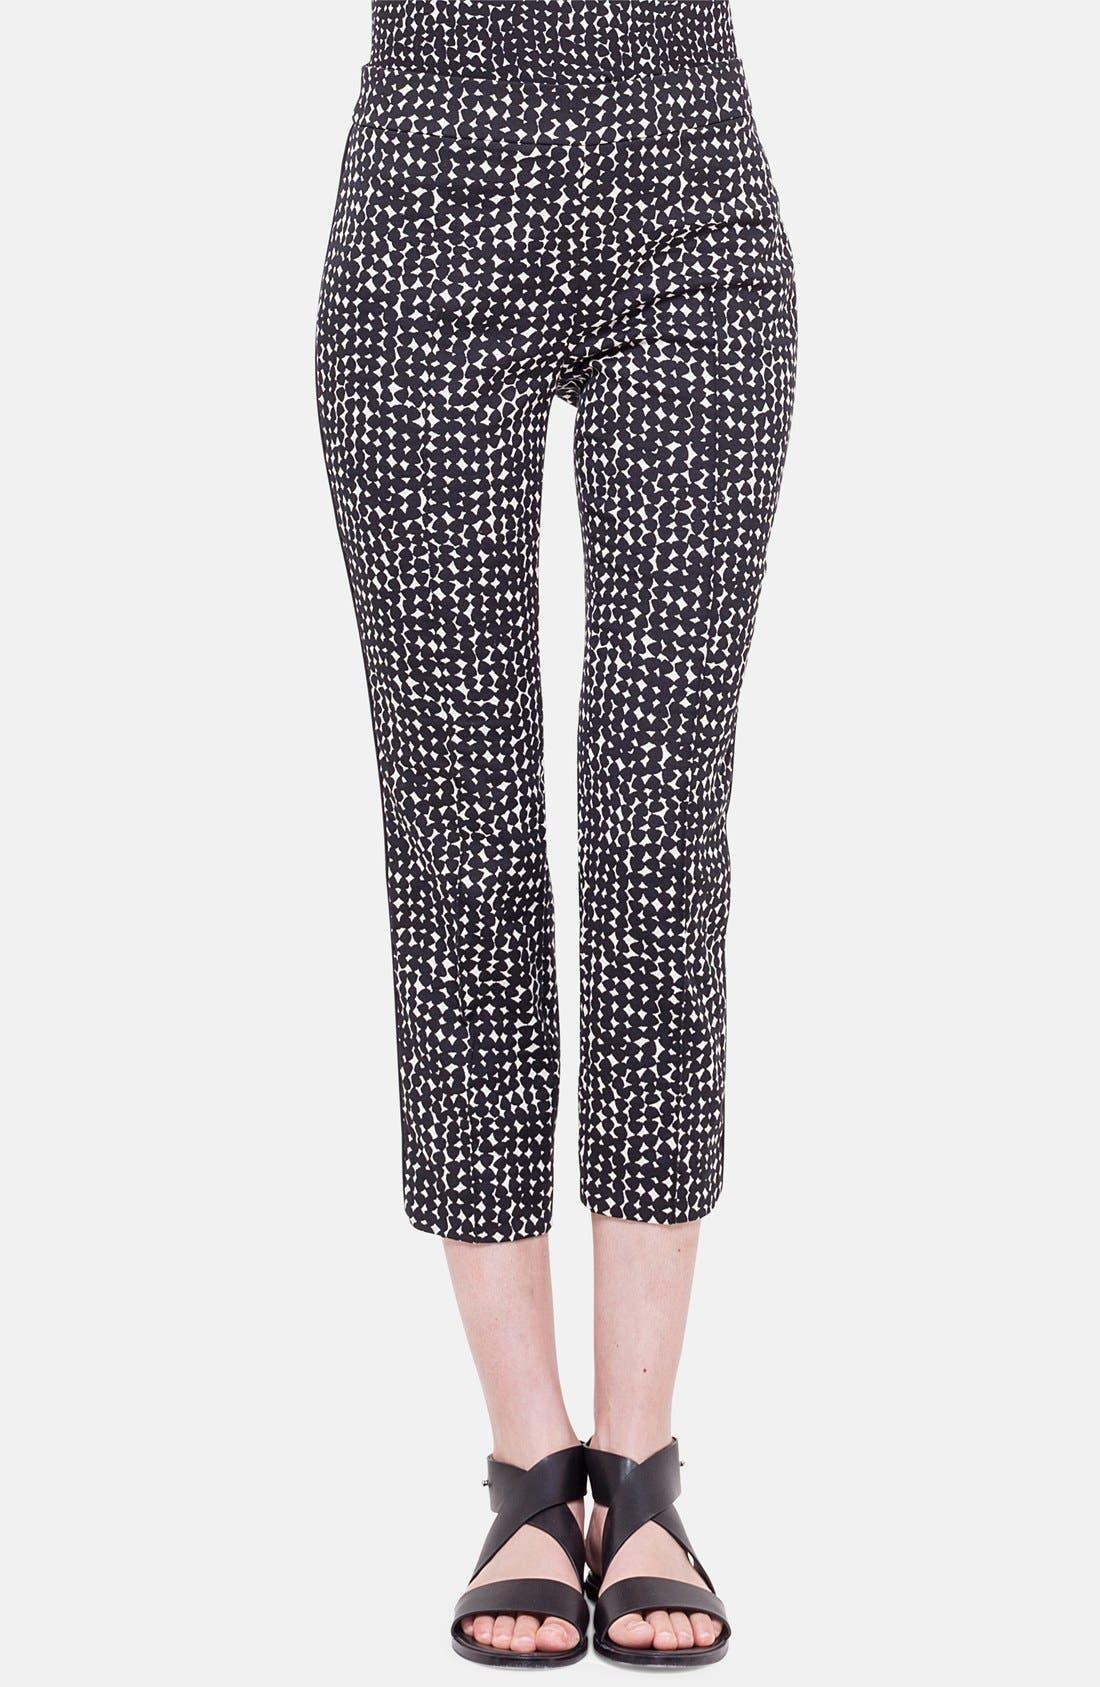 Alternate Image 1 Selected - Akris punto 'Francella' Jacquard Crop Pants